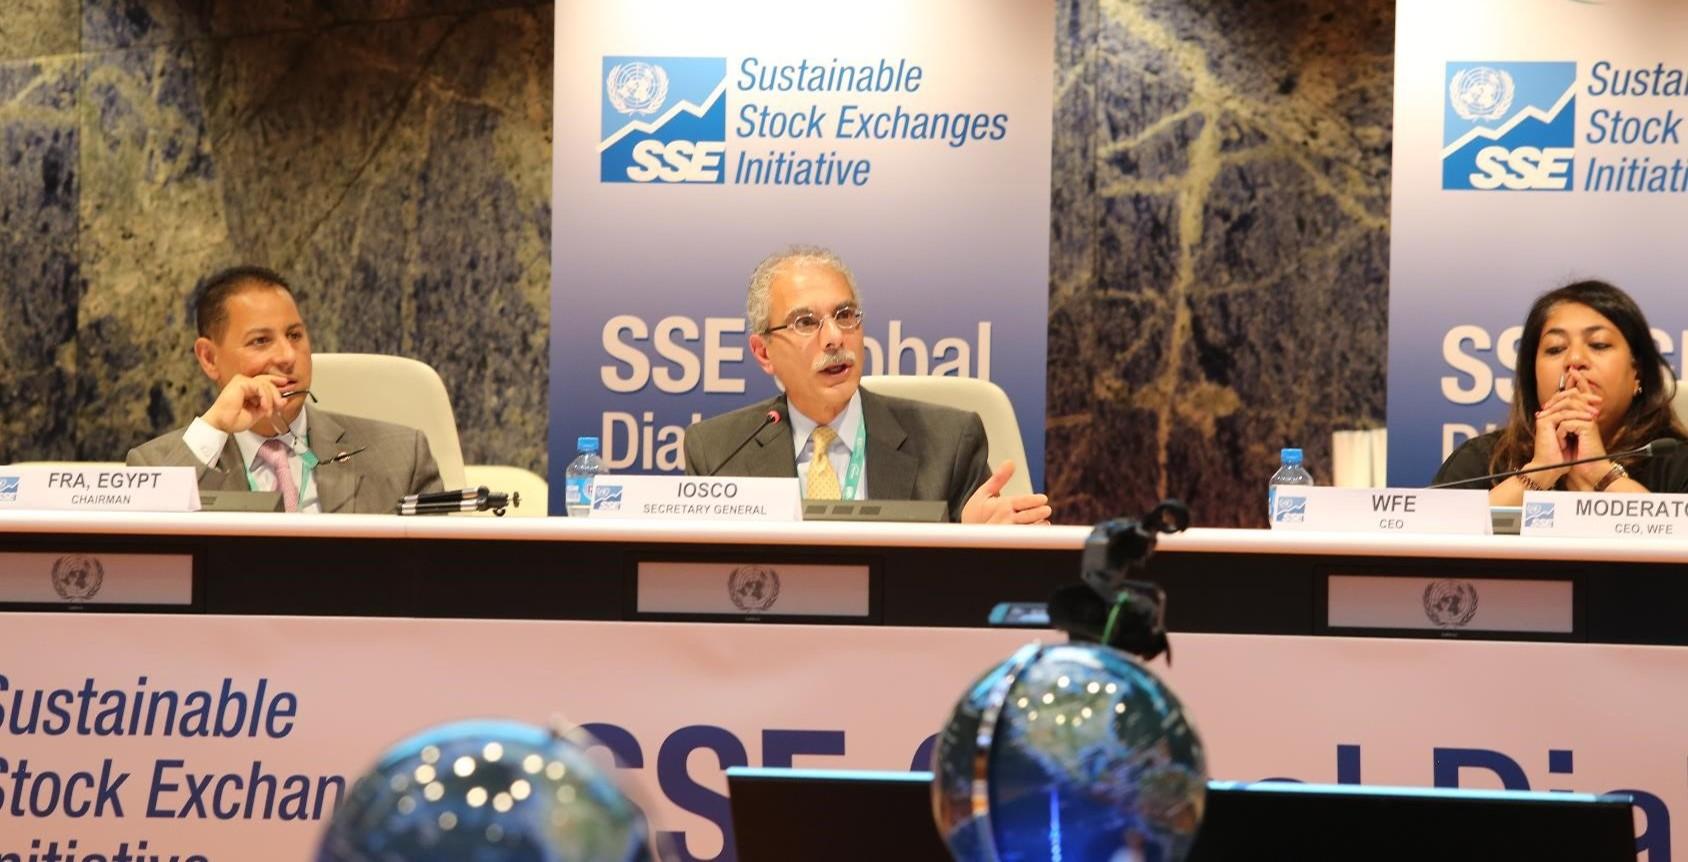 IOSCO creates Sustainable Finance Network, releases statement on ESG disclosure